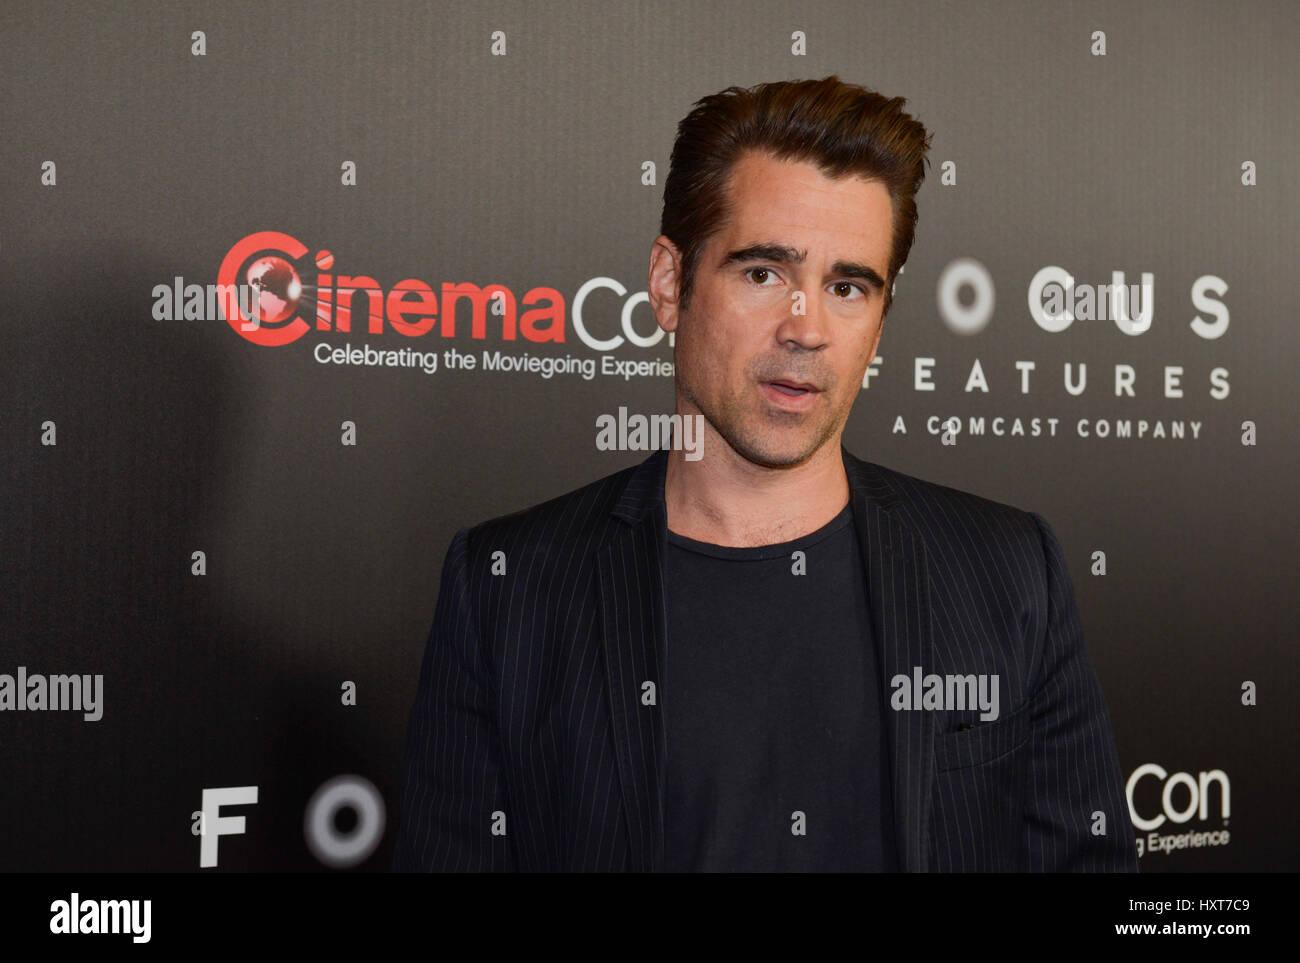 Las Vegas, NV, USA. Mar 29, 2017. Colin Ferrell à Cinema Con 2017 Déjeuner de Focus Features et Studio Photo Stock